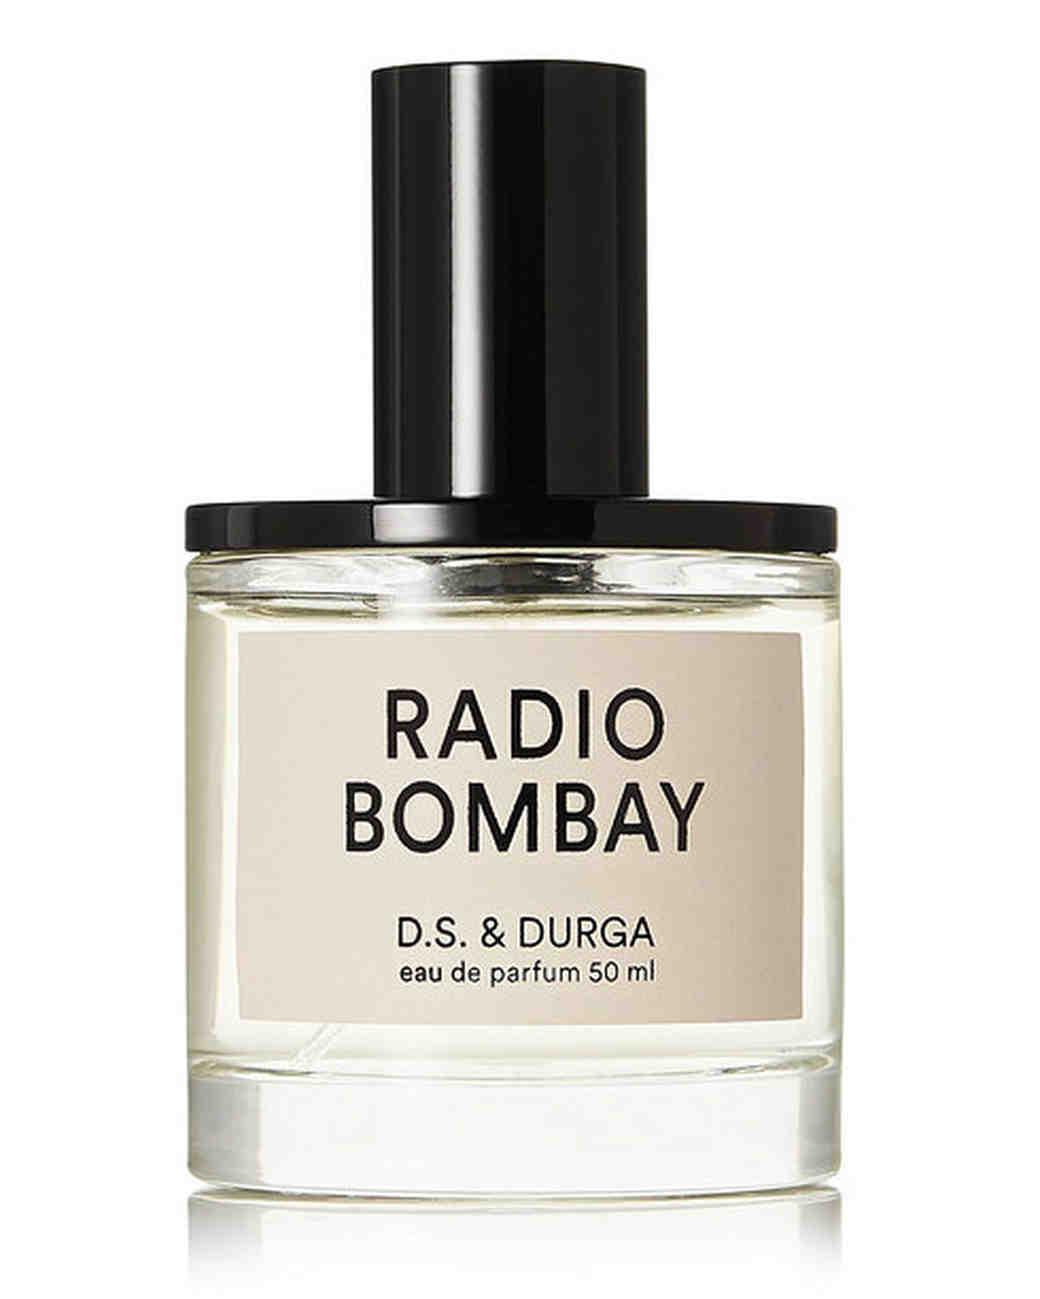 radio bombay fragrance